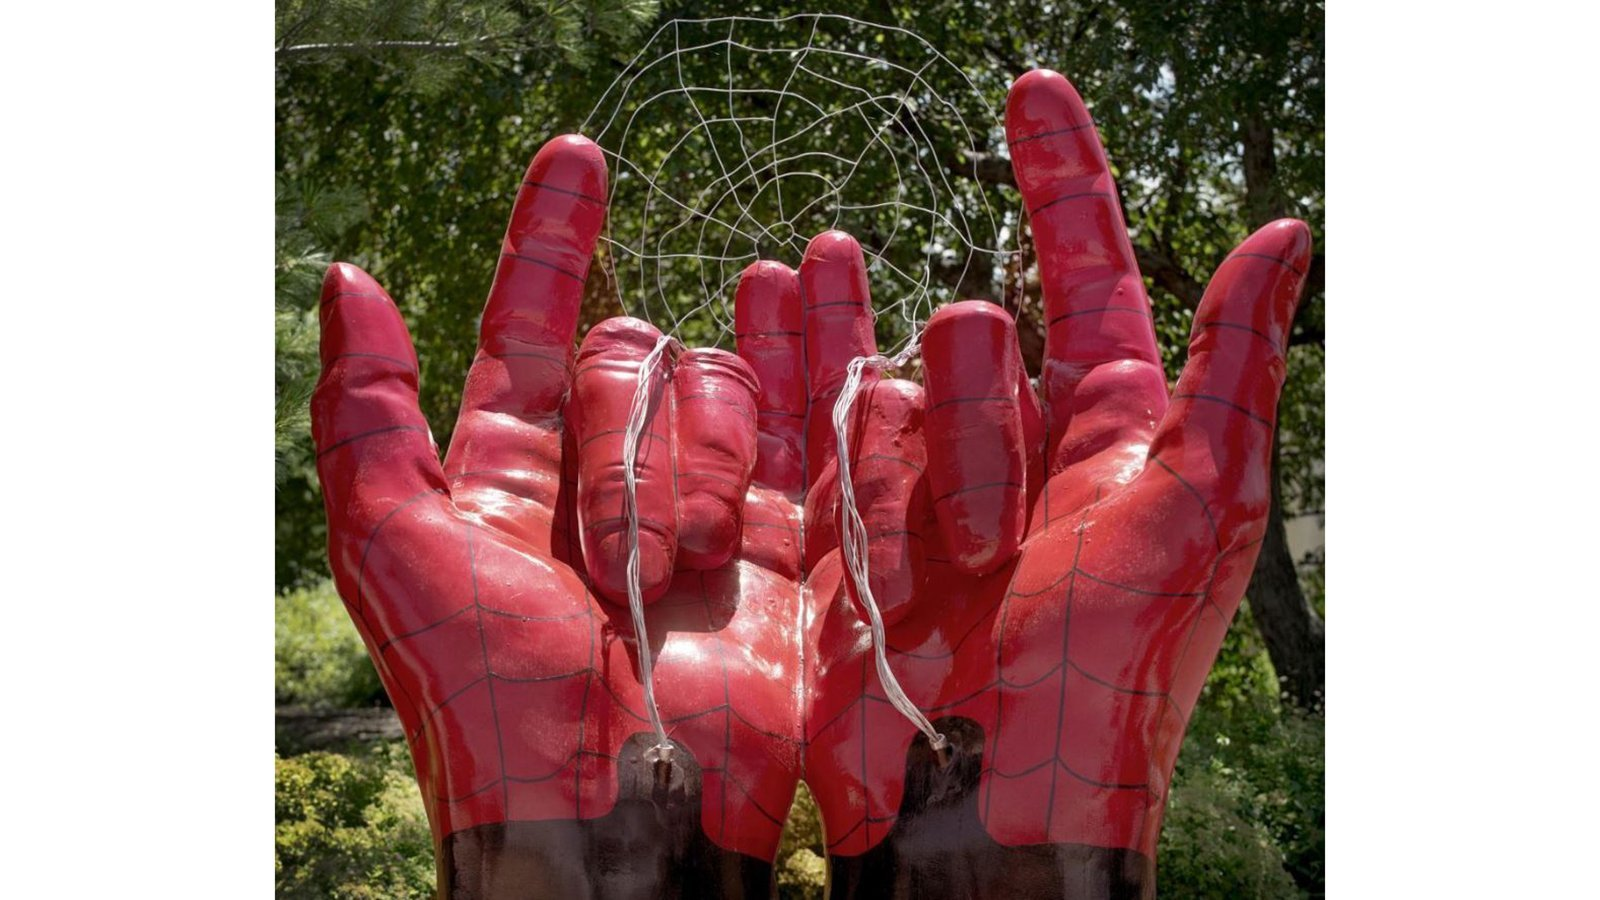 A Nebraska city explains its public art shows Spider-man's hands, not devil horns